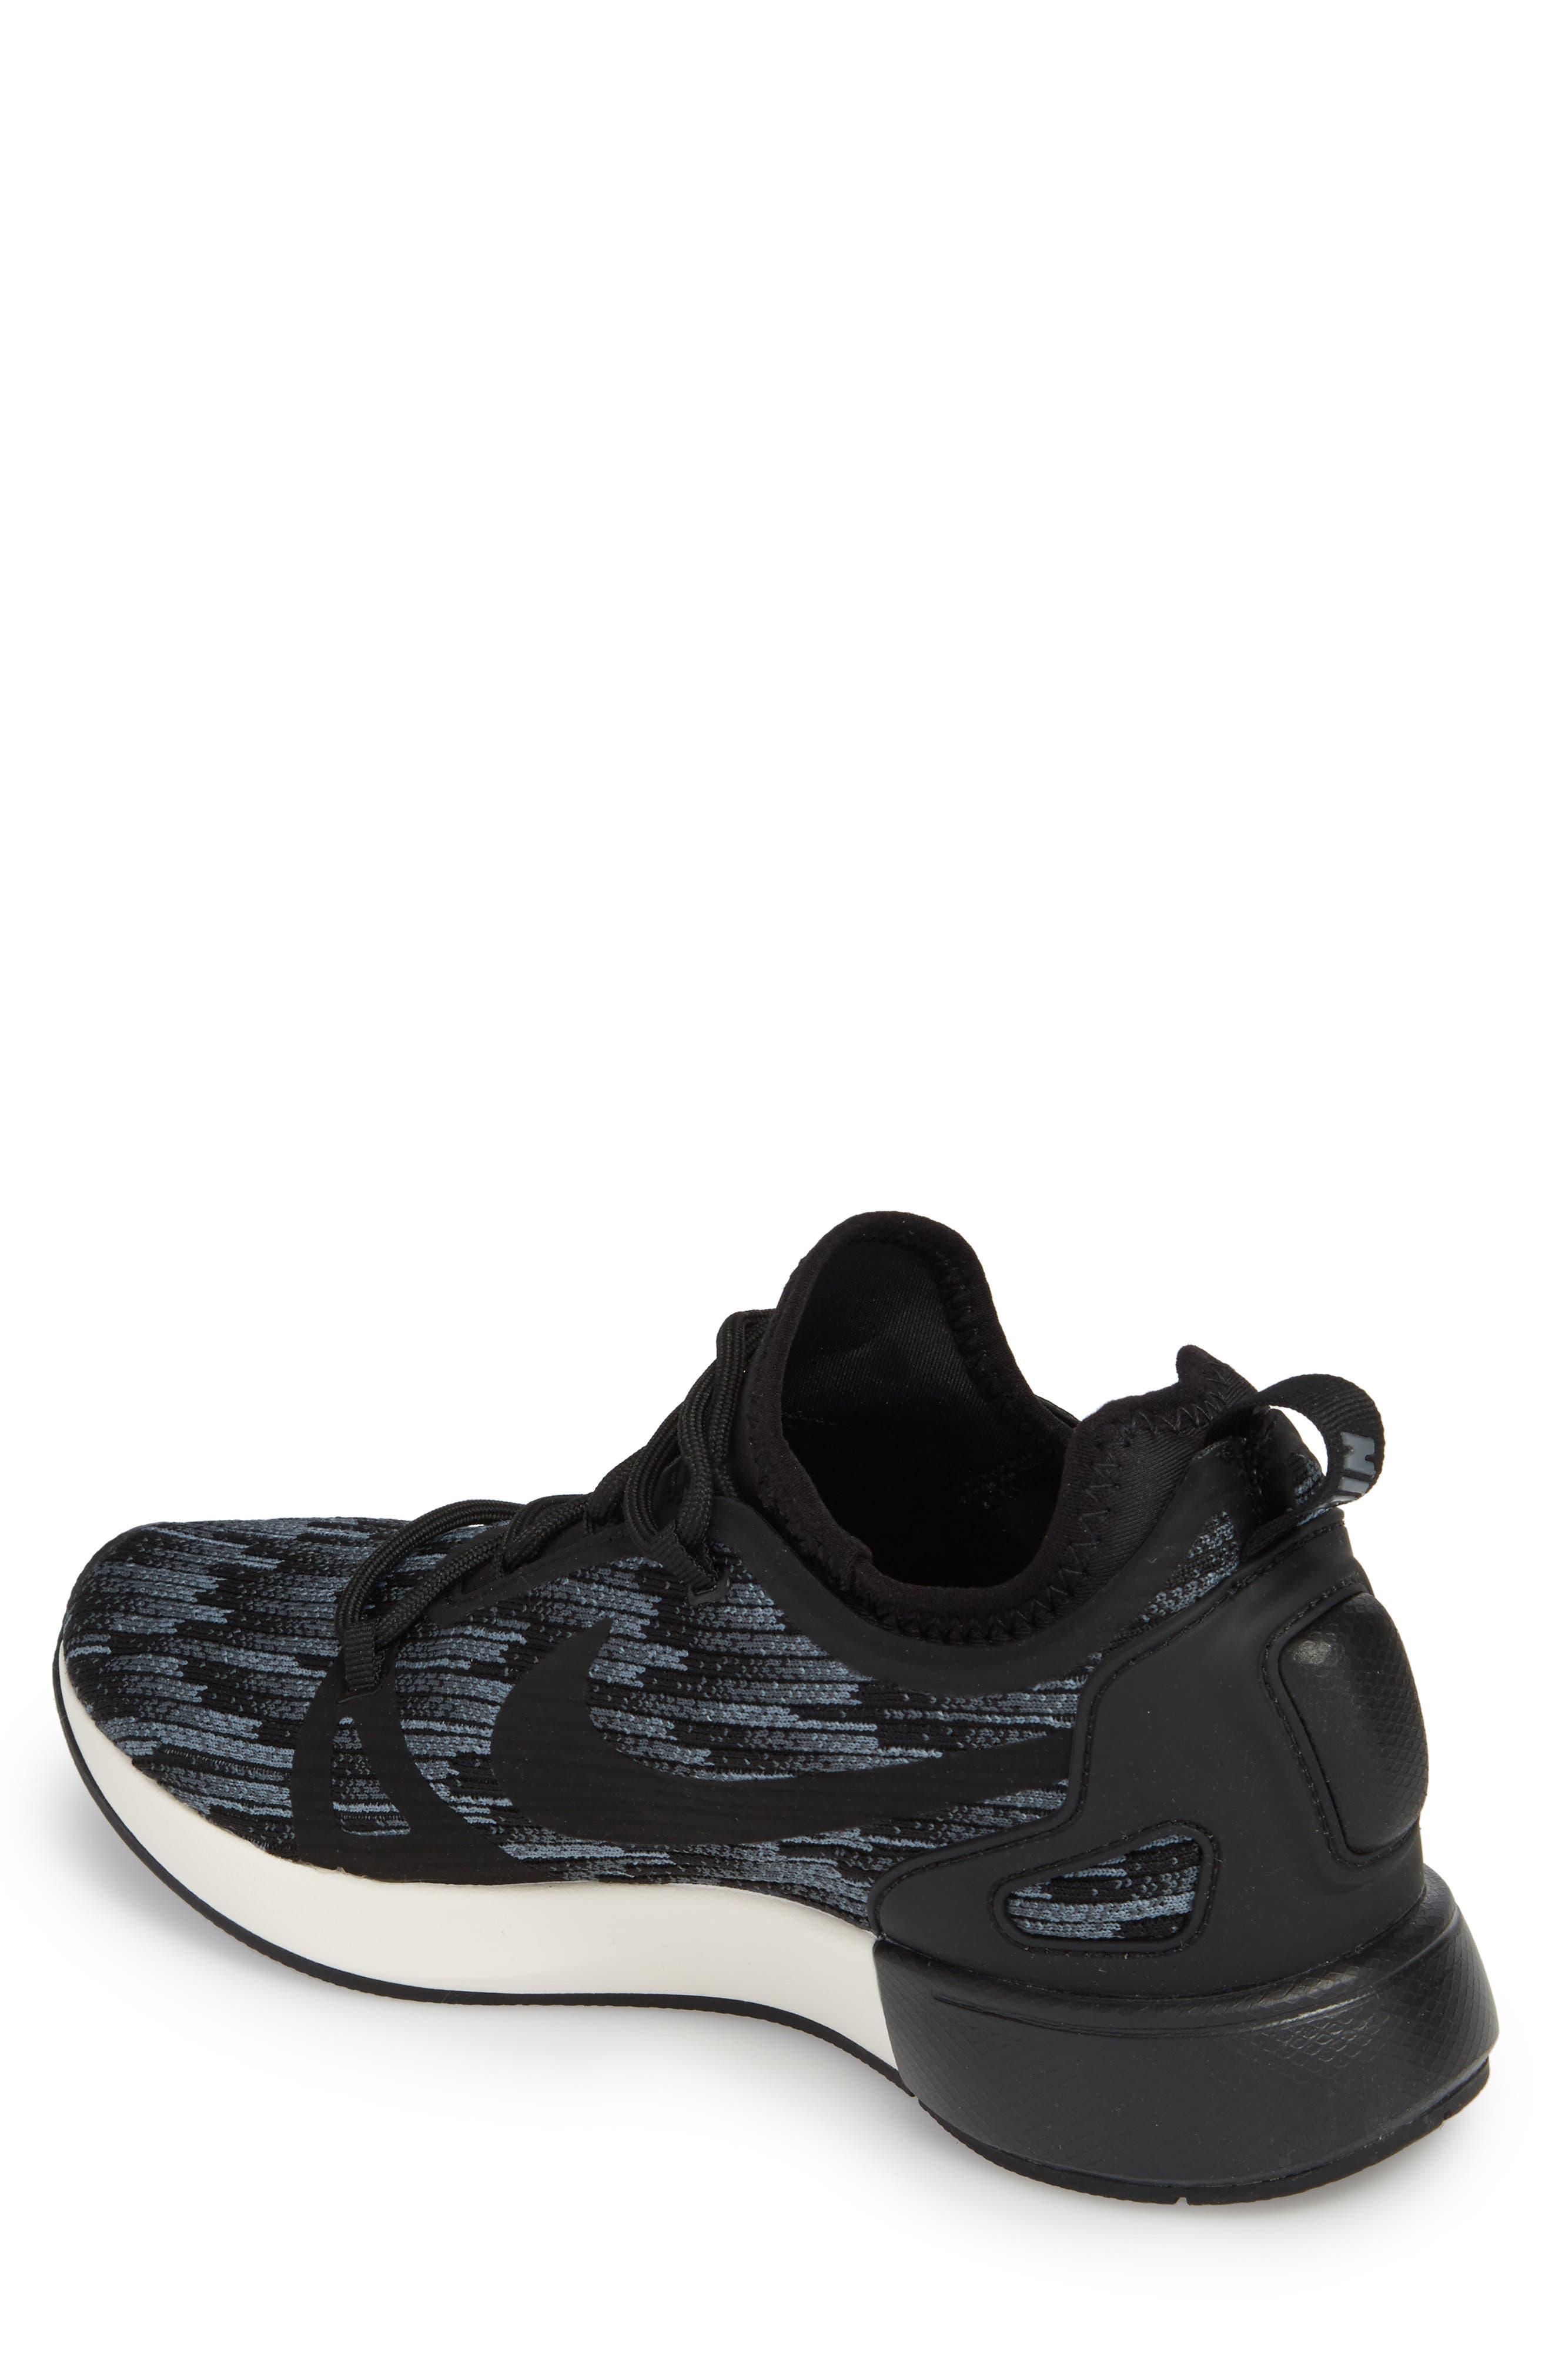 Alternate Image 2  - Nike Duel Racer SE Knit Sneaker (Women)